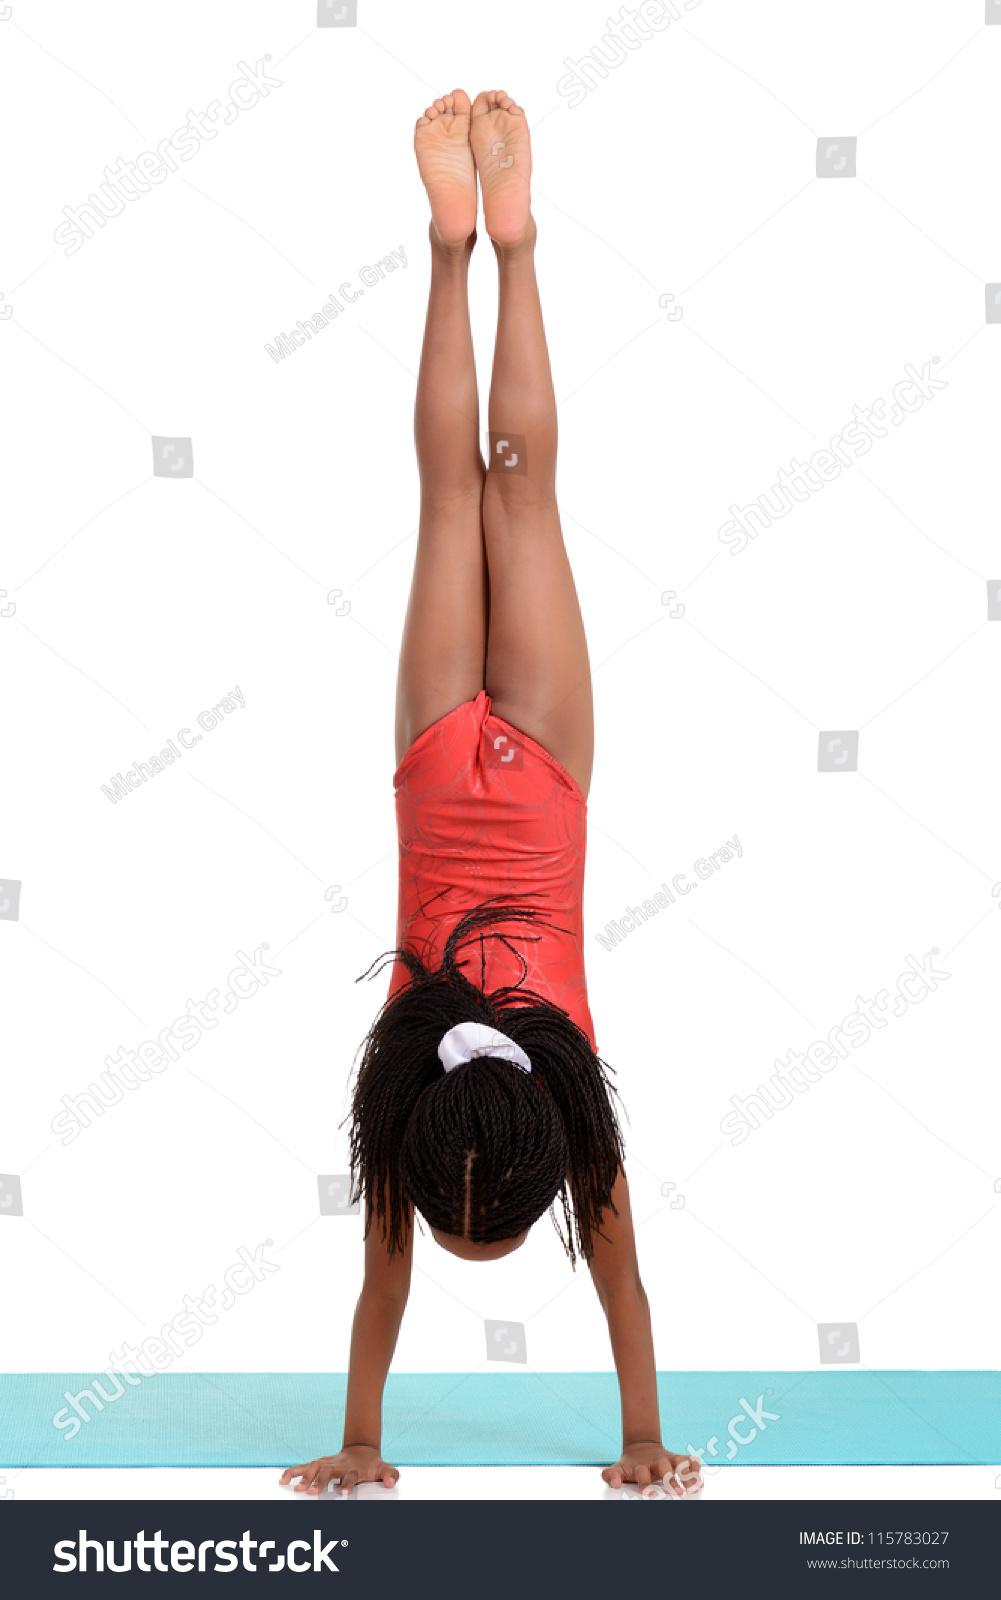 Young Girl Doing Gymnastics Handstand Stock Photo -3358